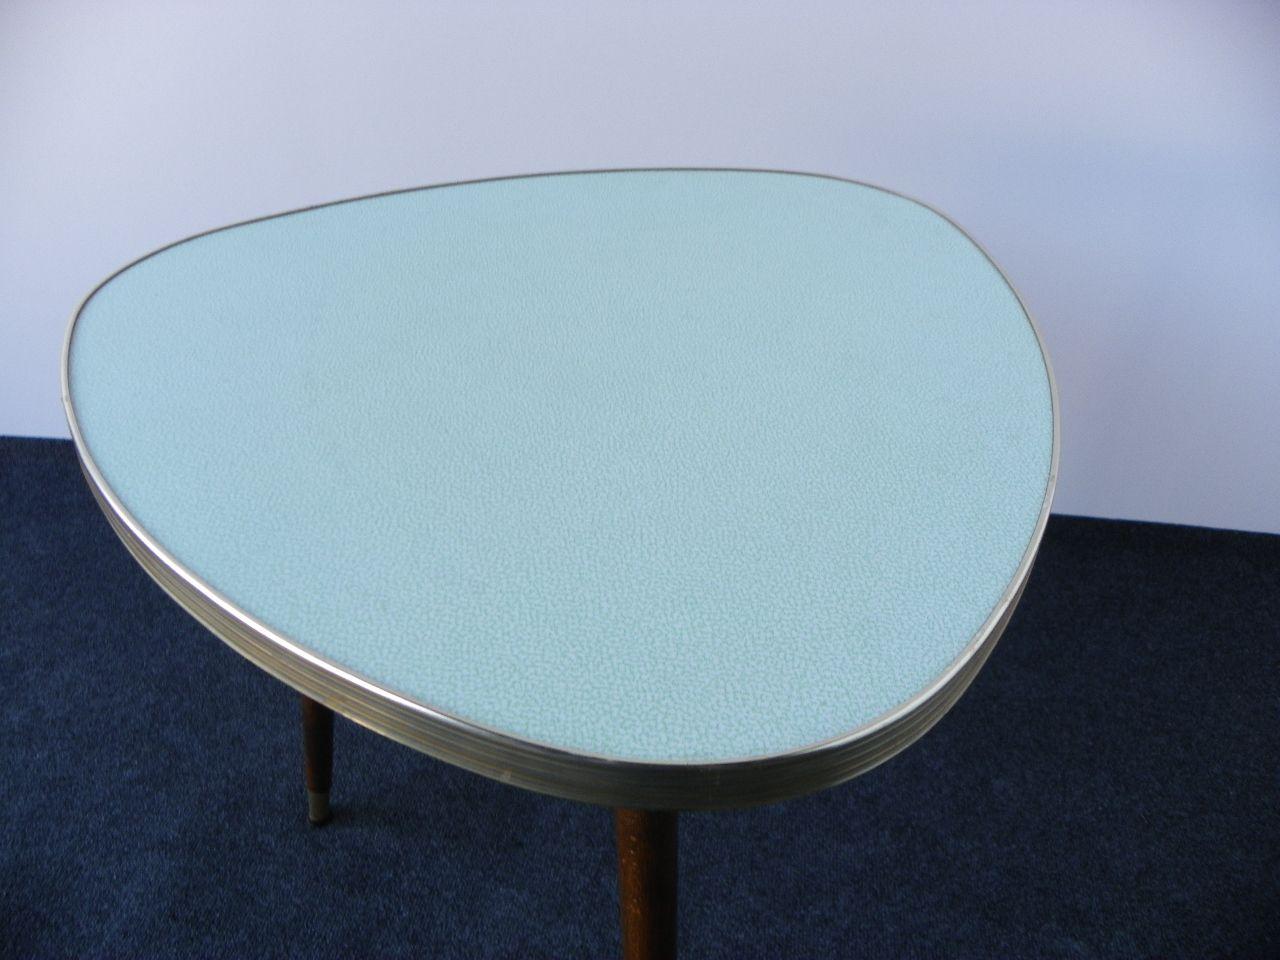 Midcentury Modern Triangular Coffee Table, 1960s